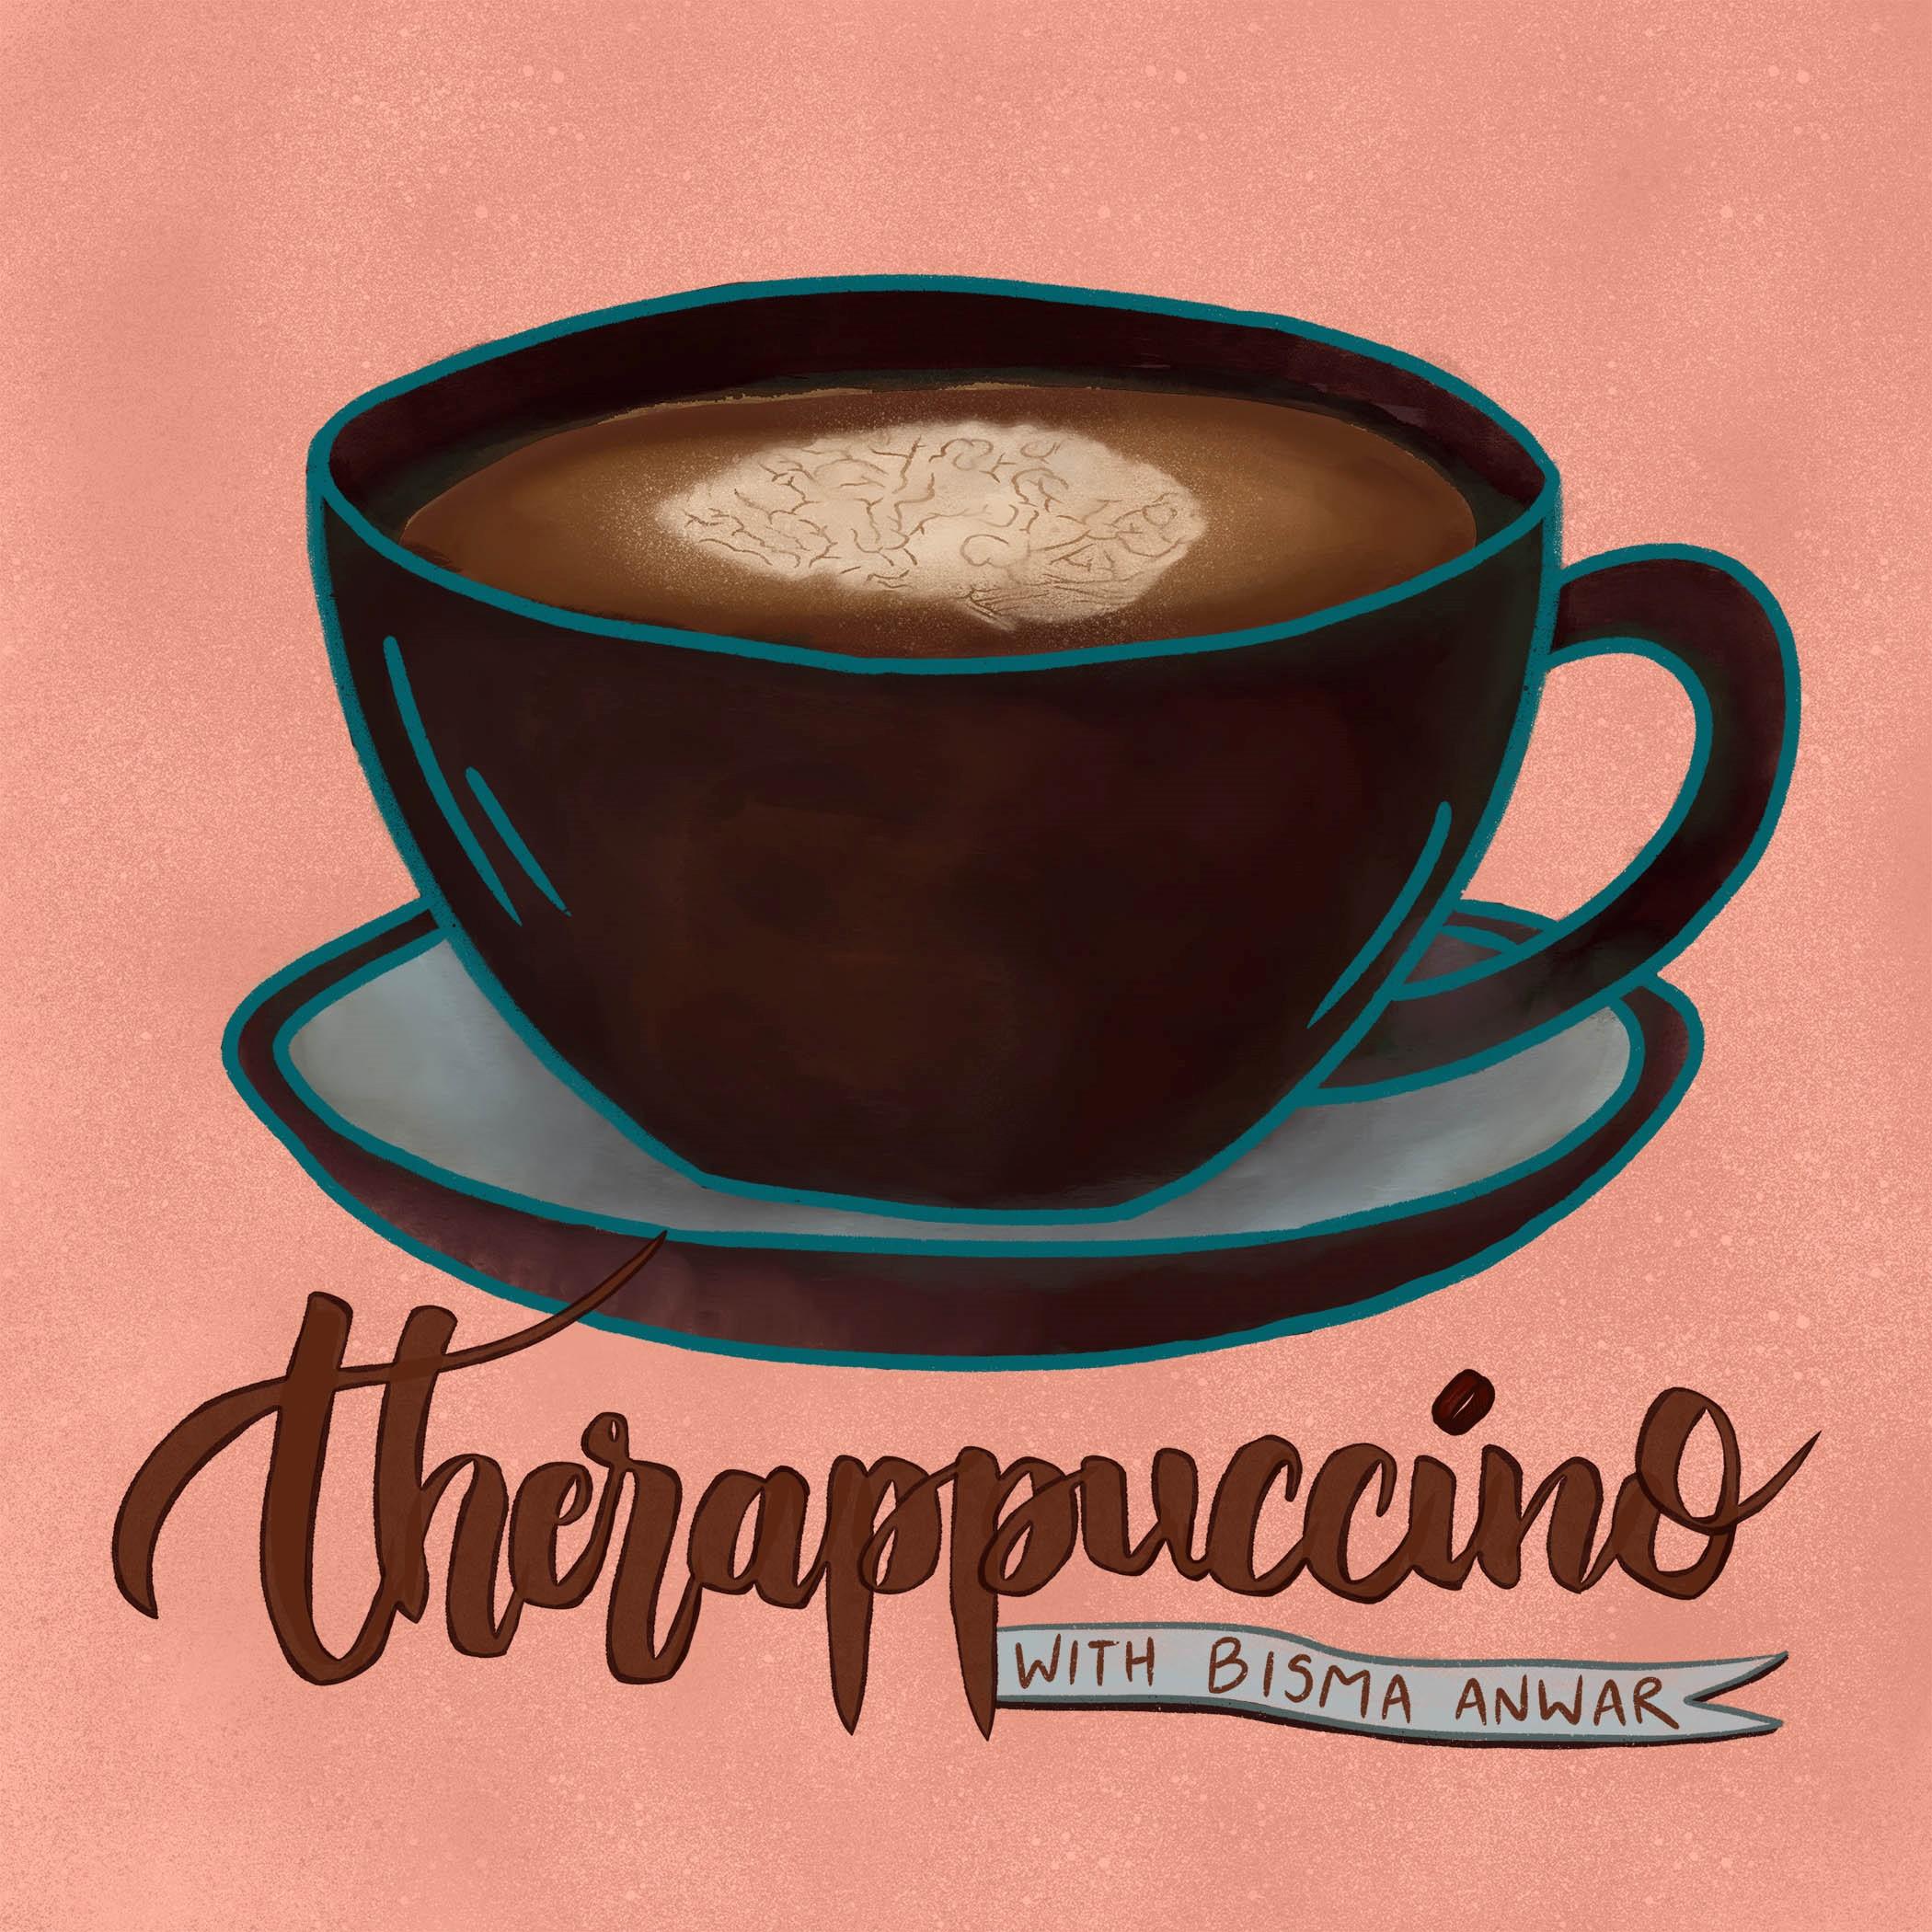 Therappuccino show art